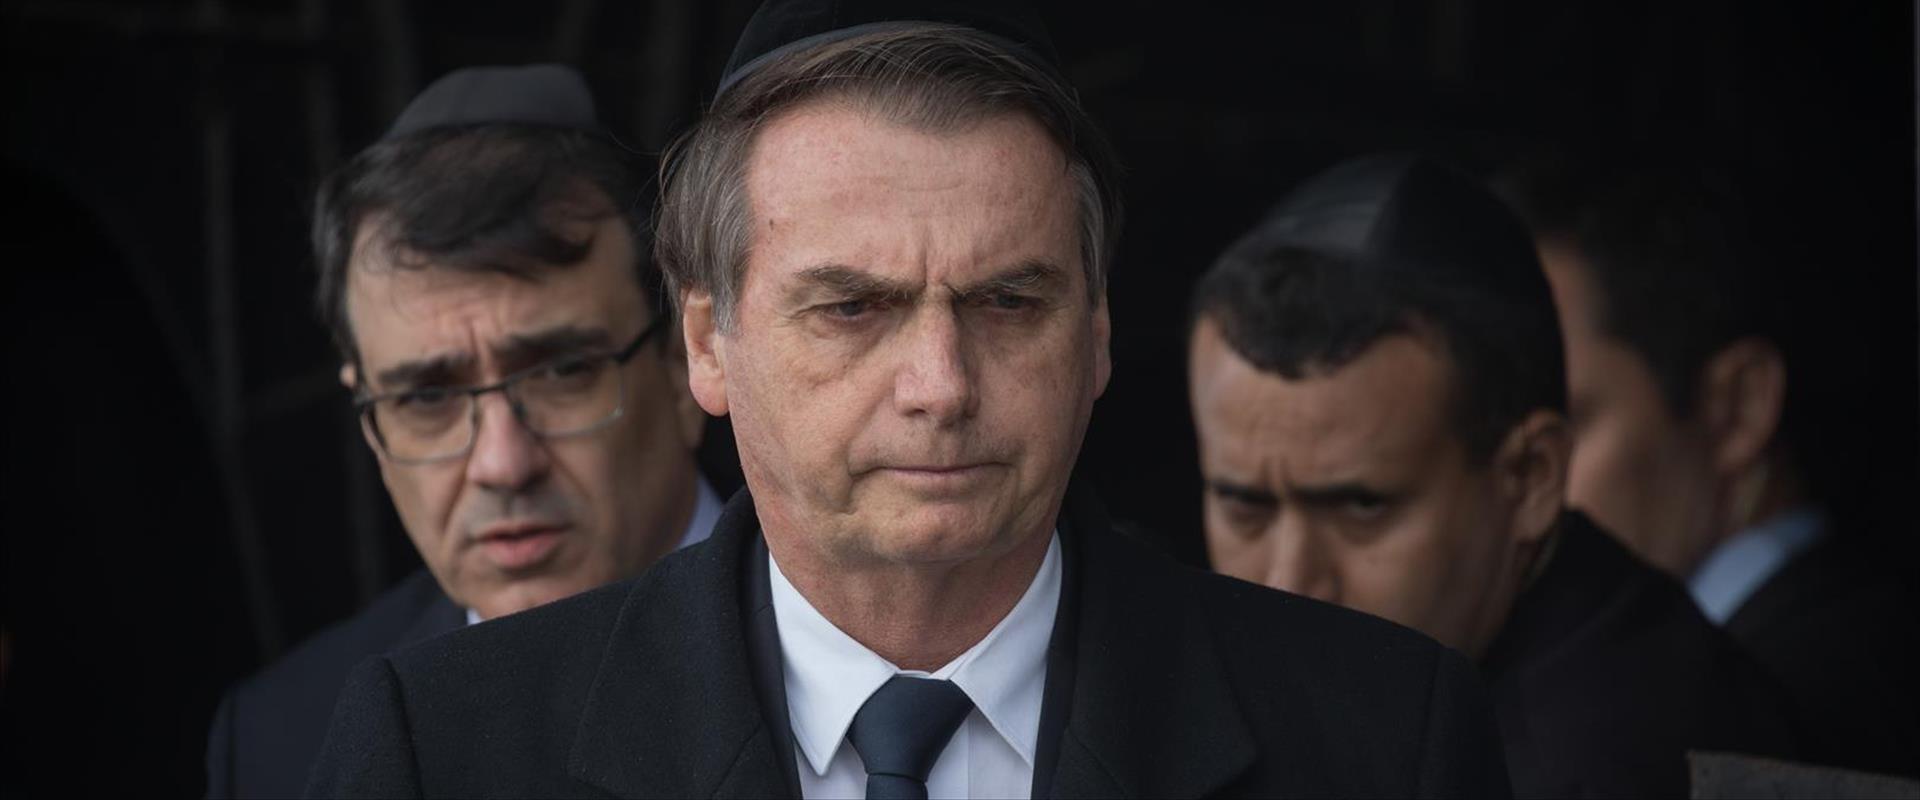 נשיא ברזיל ז'איר בולסנארו